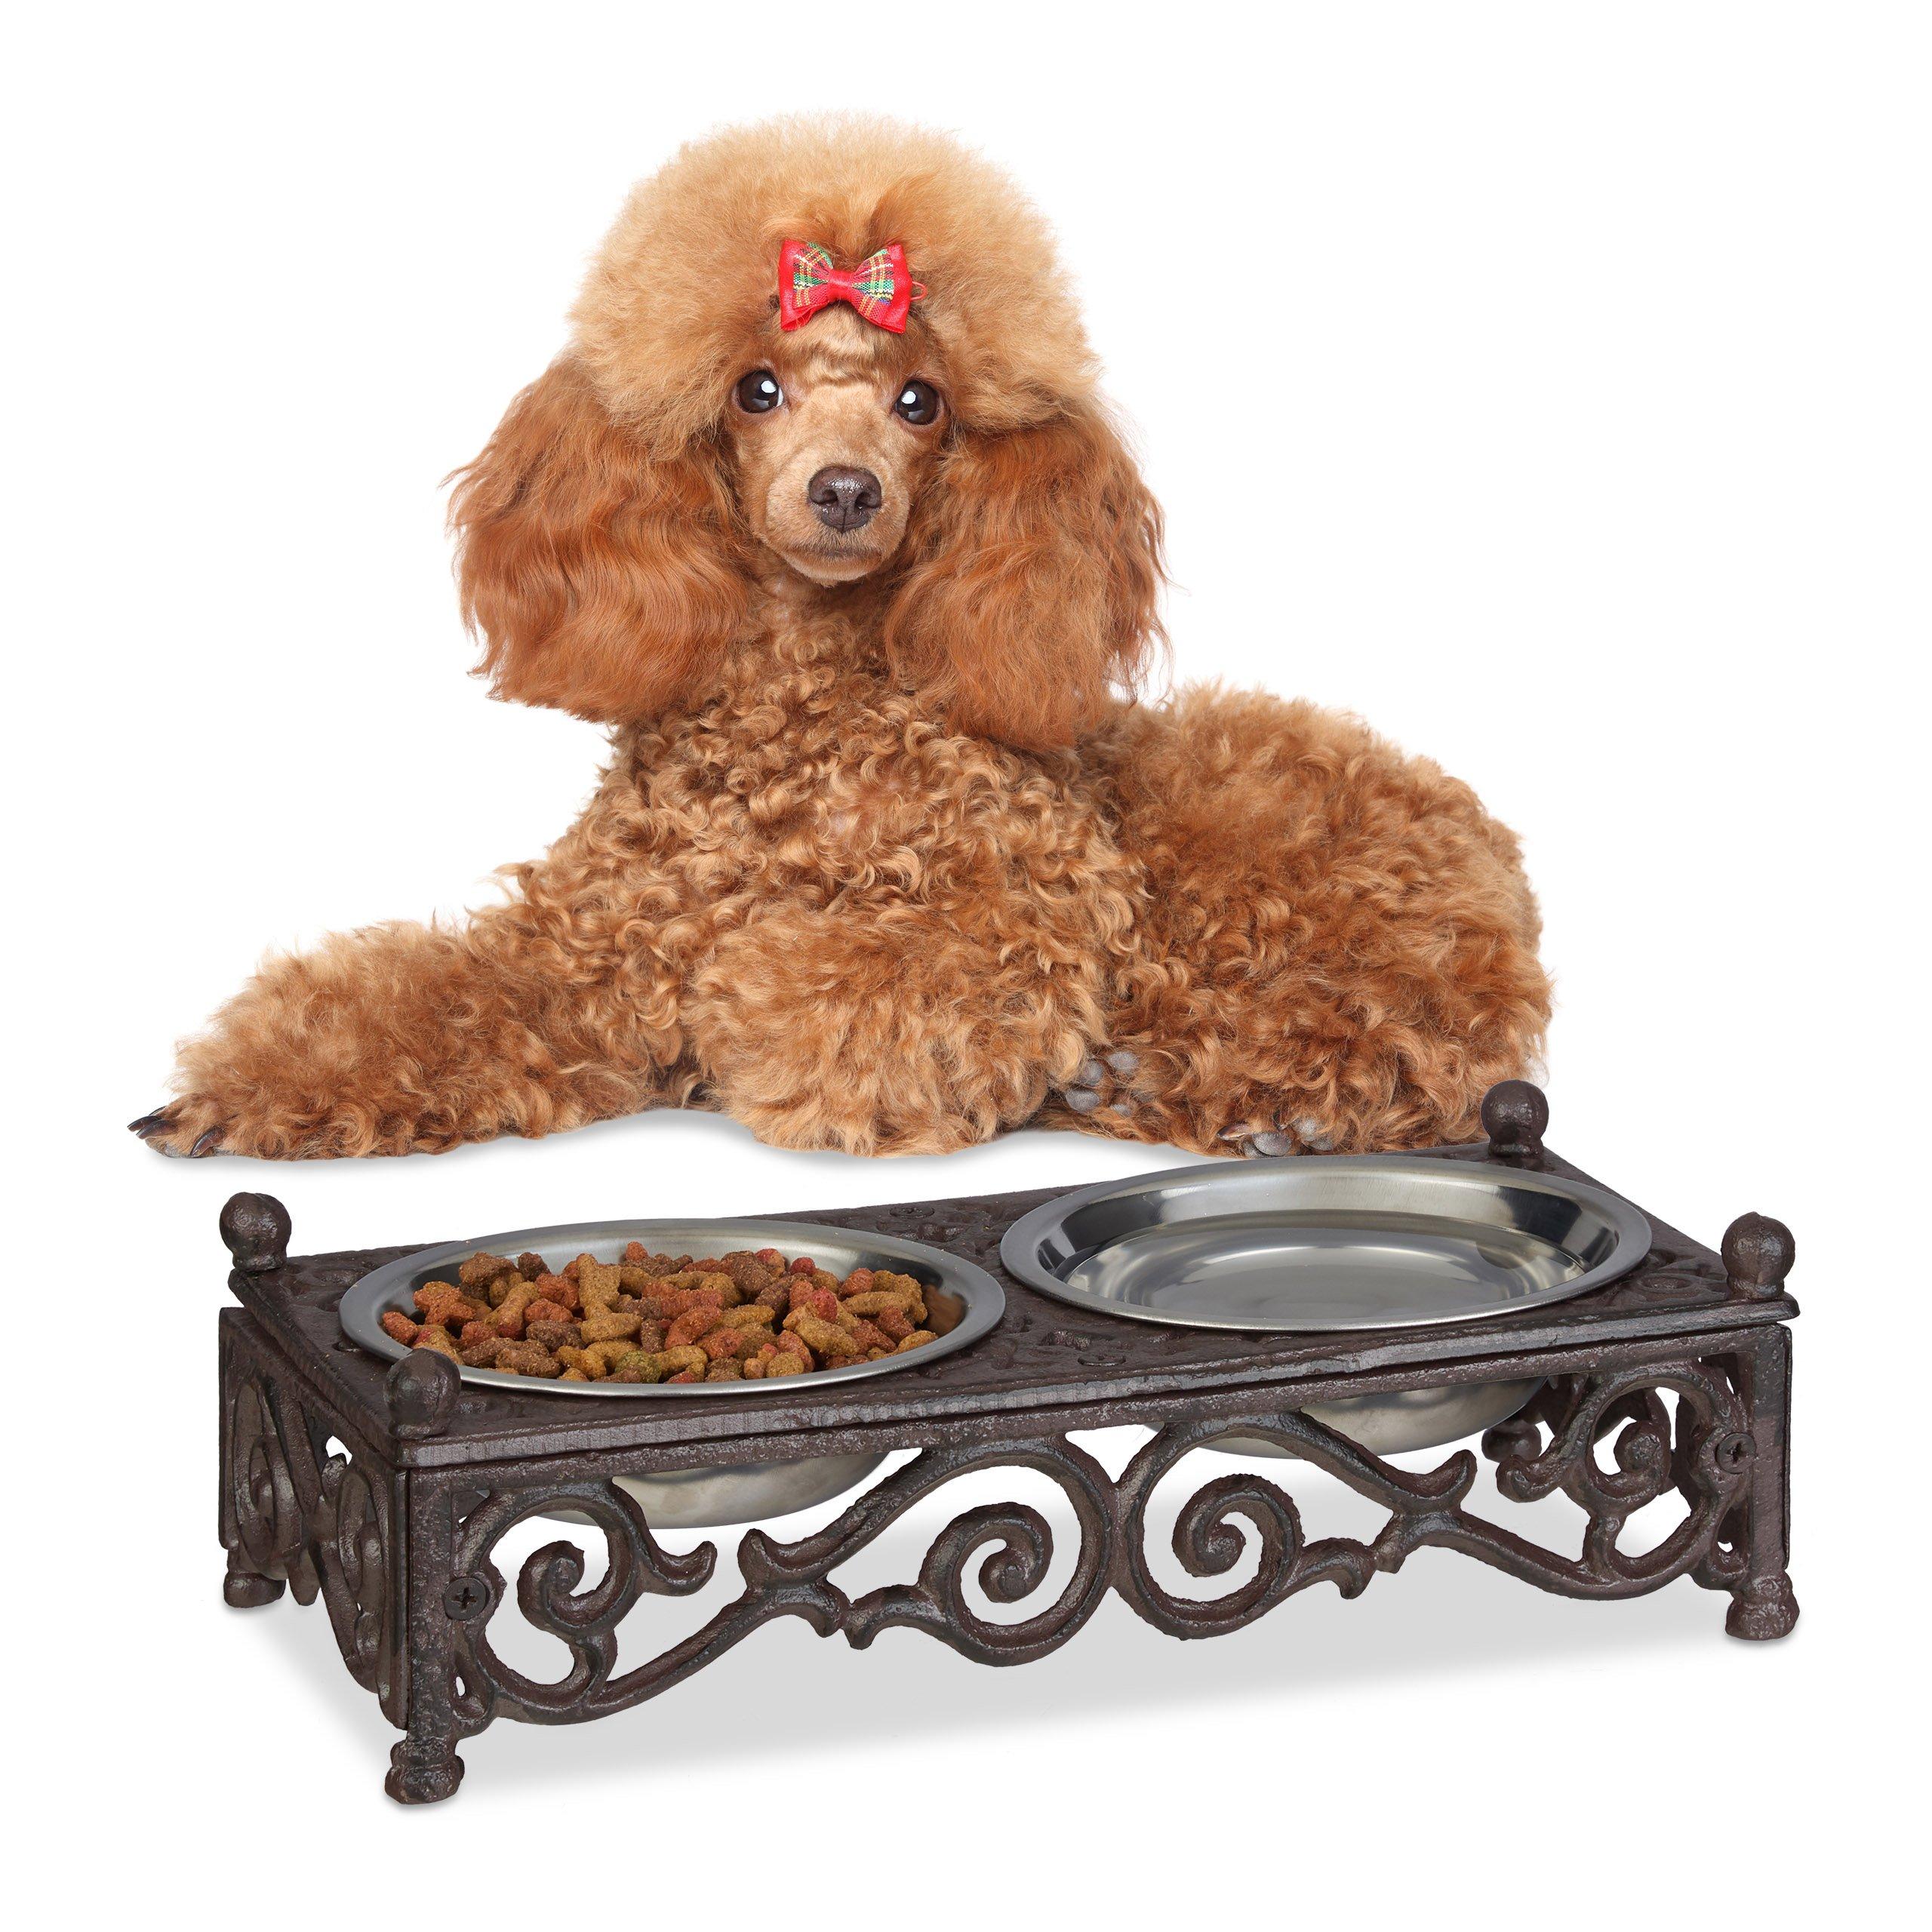 Relaxdays Dog Bowl Set, Brown, 9 x 29.5 x 14.5 cm